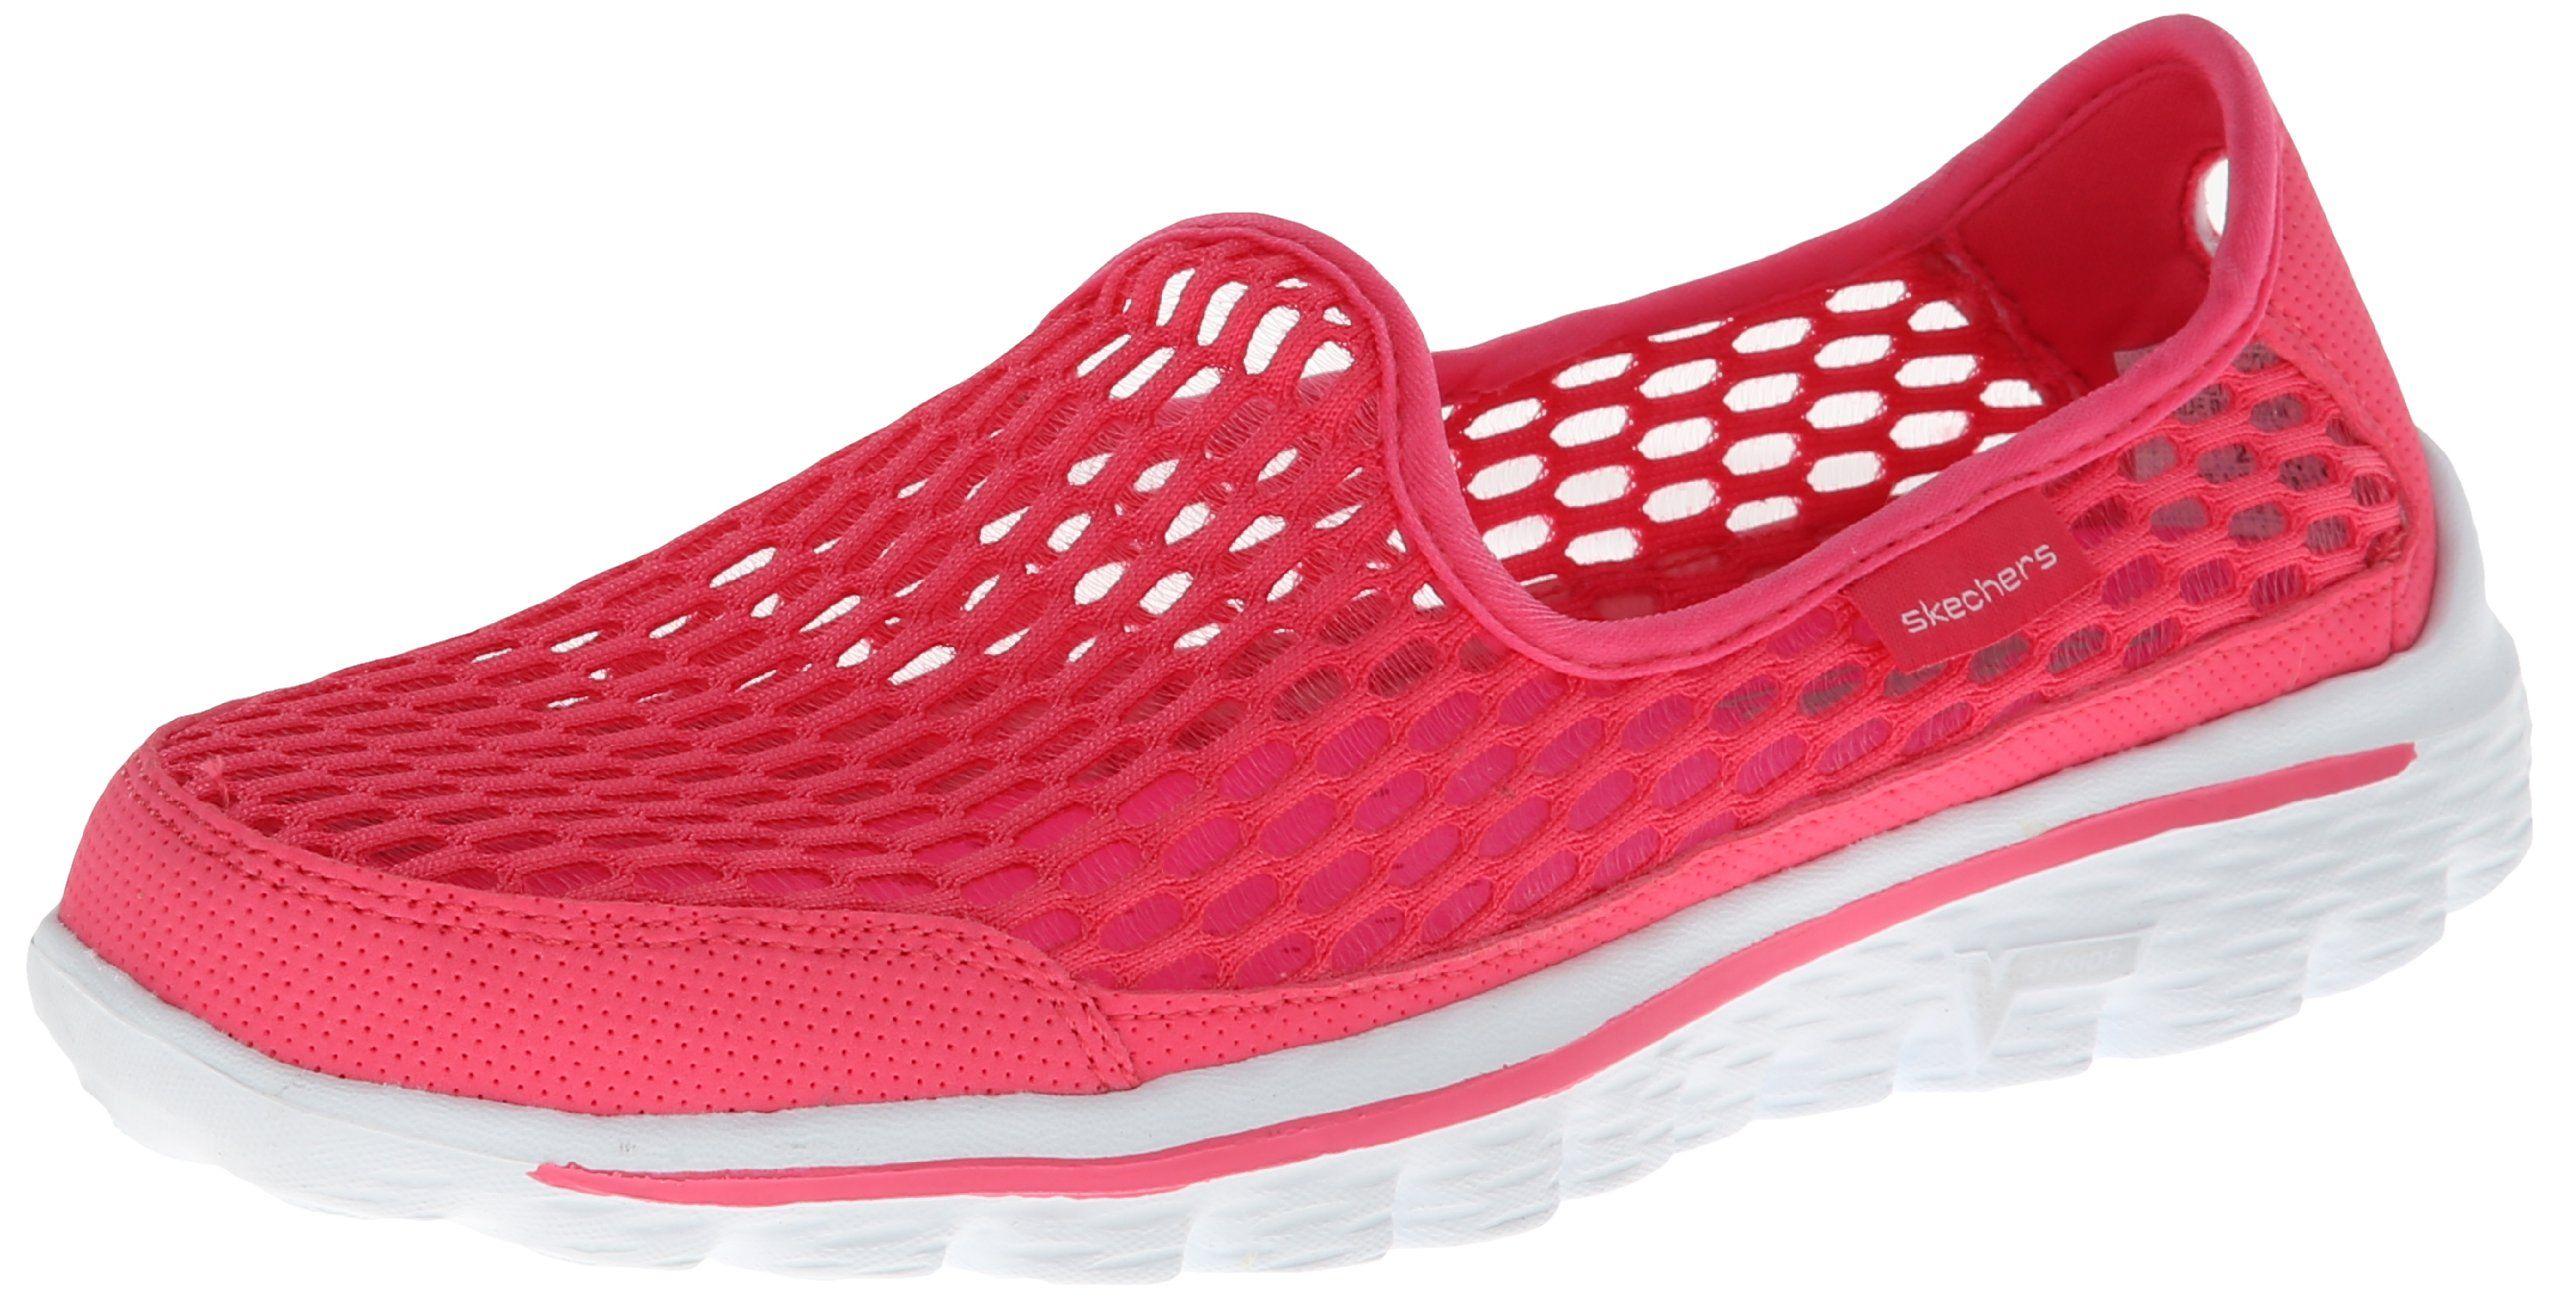 Contribuyente Descubrimiento Pescador  Amazon.com: Skechers Women's Go Walk 2 Super Breathe Walking Shoe: Shoes |  Skechers, Skechers women, Skechers performance